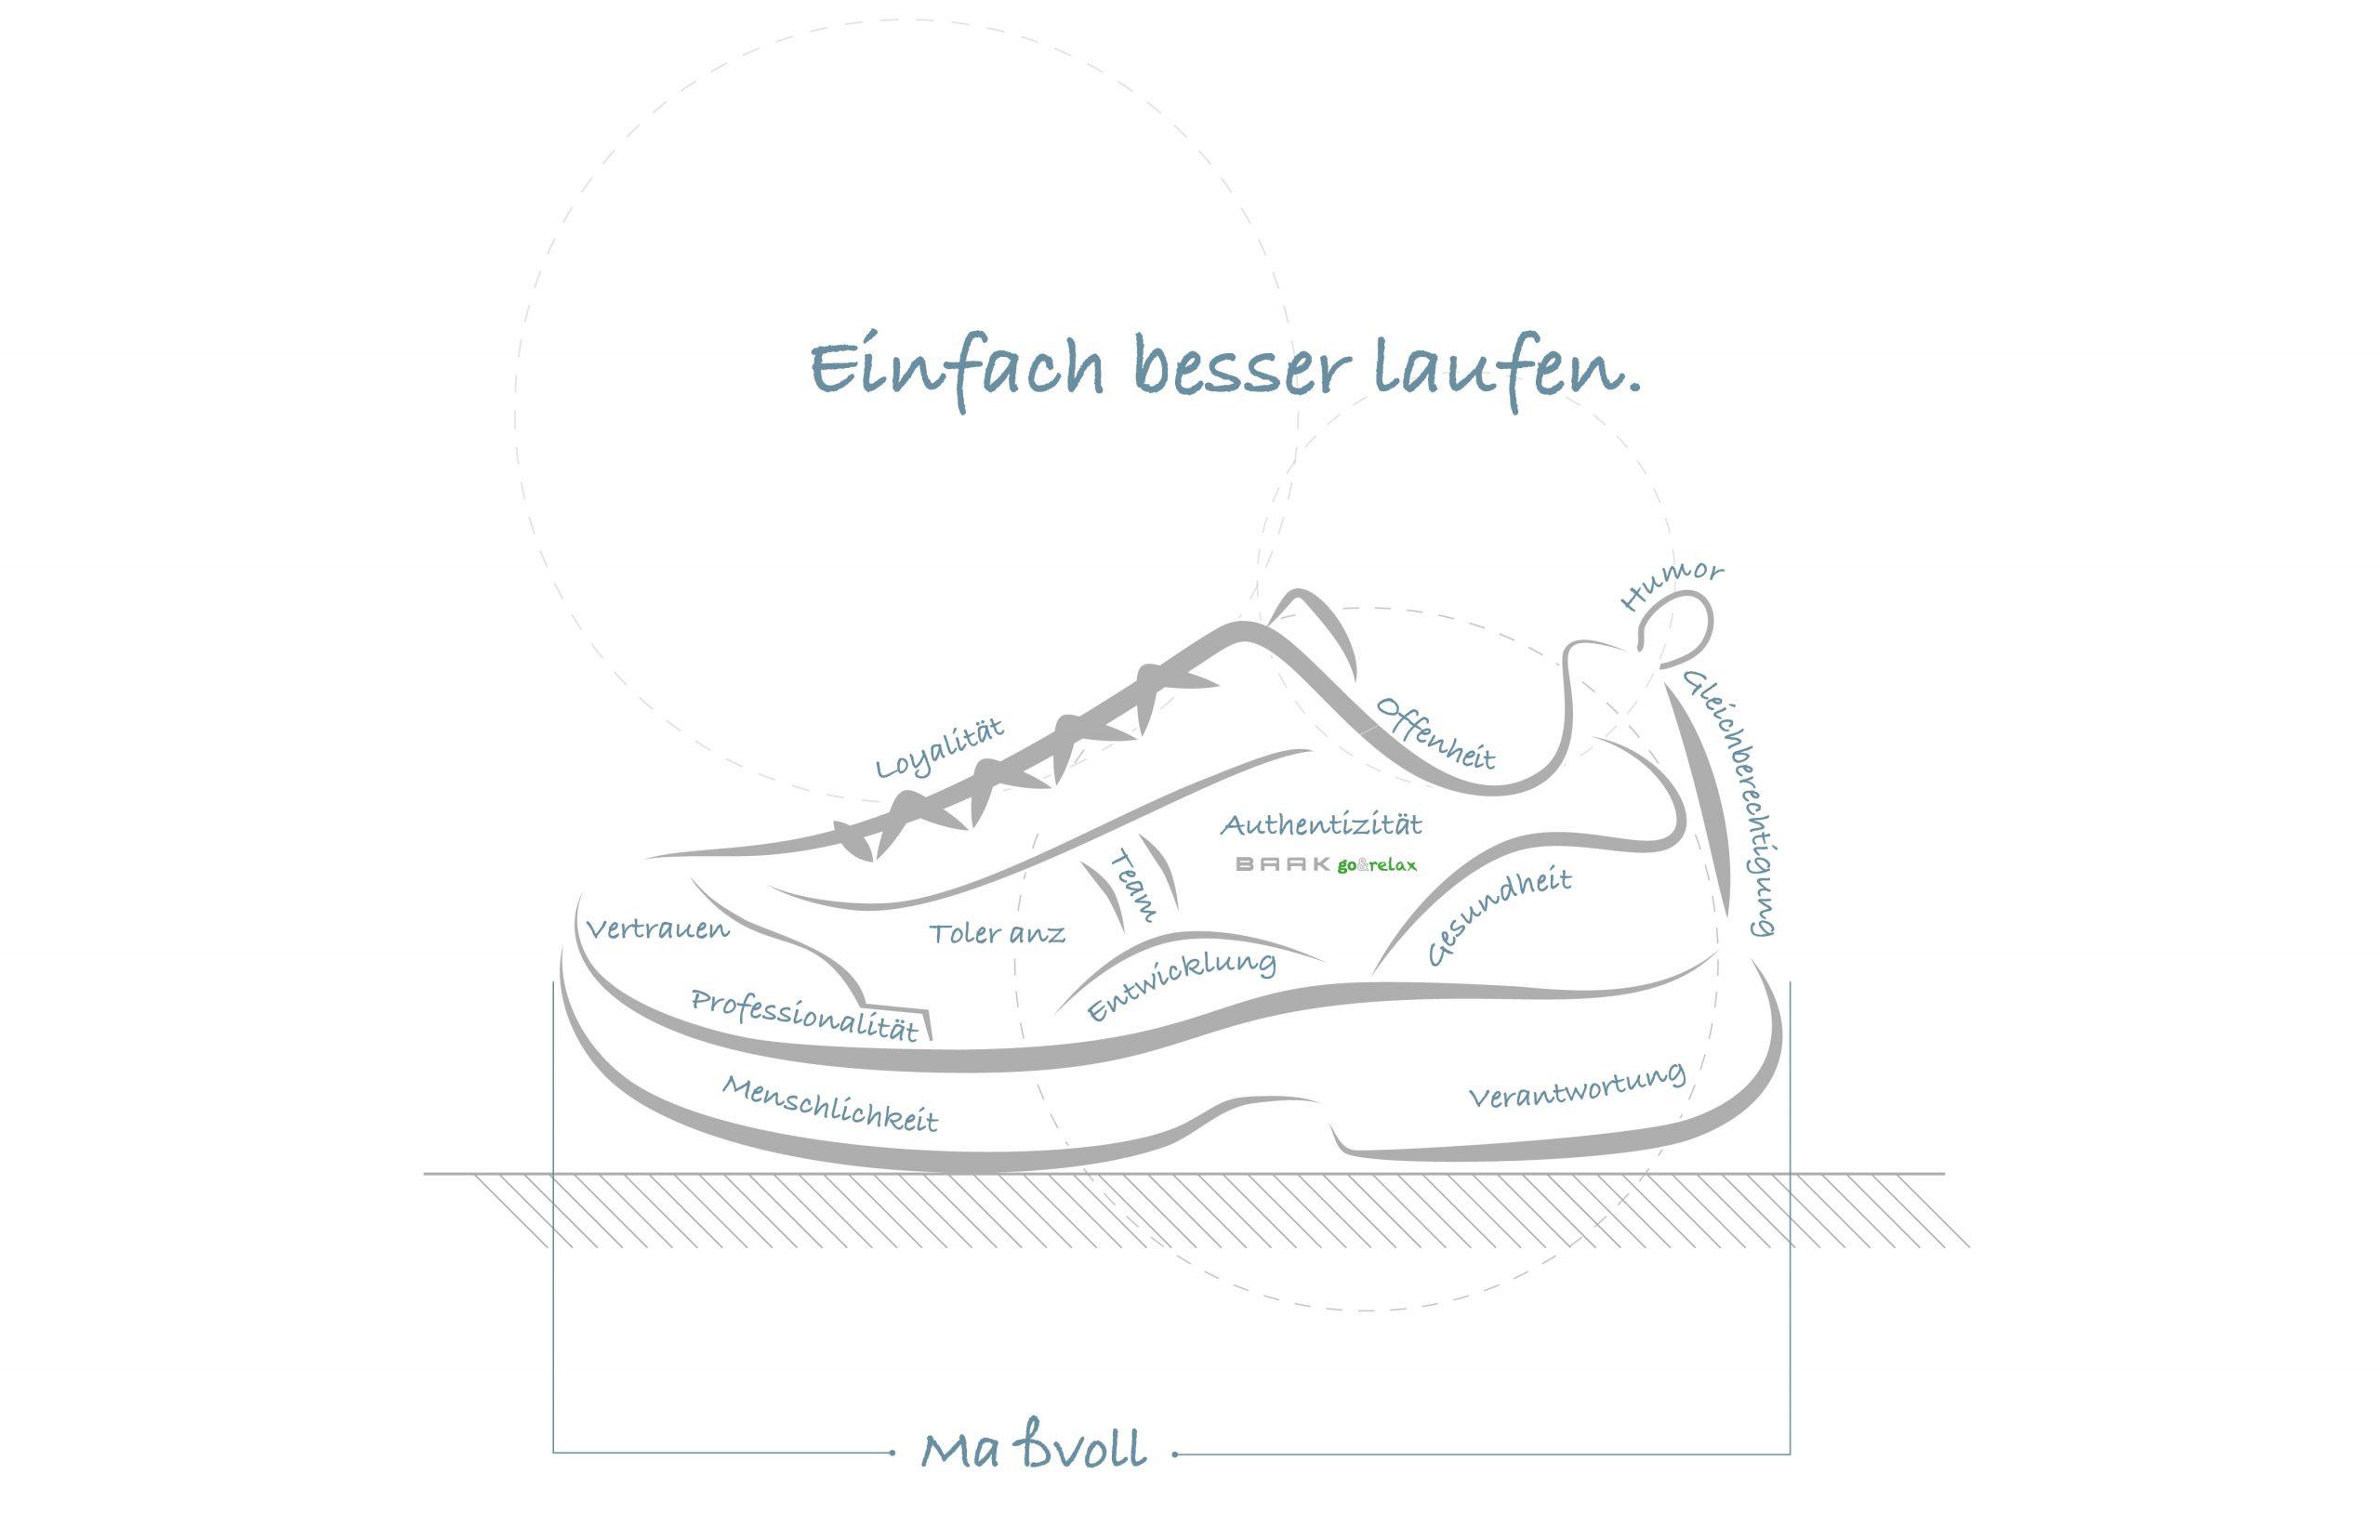 Printmedien-Design BAAK Bosbach